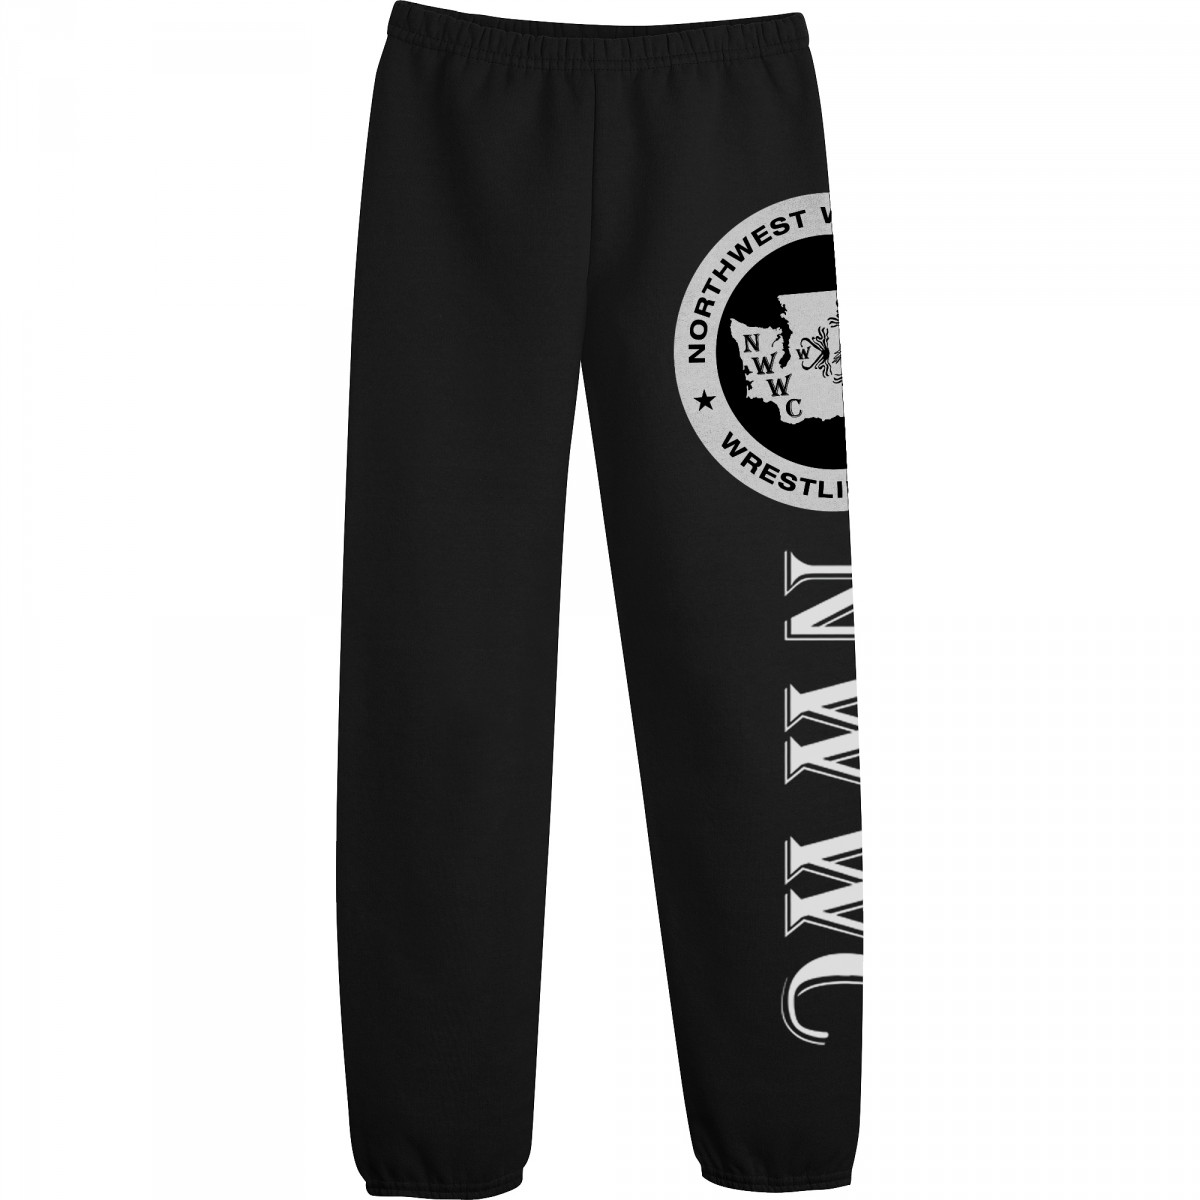 NWWC Black Sweatpants White Logo